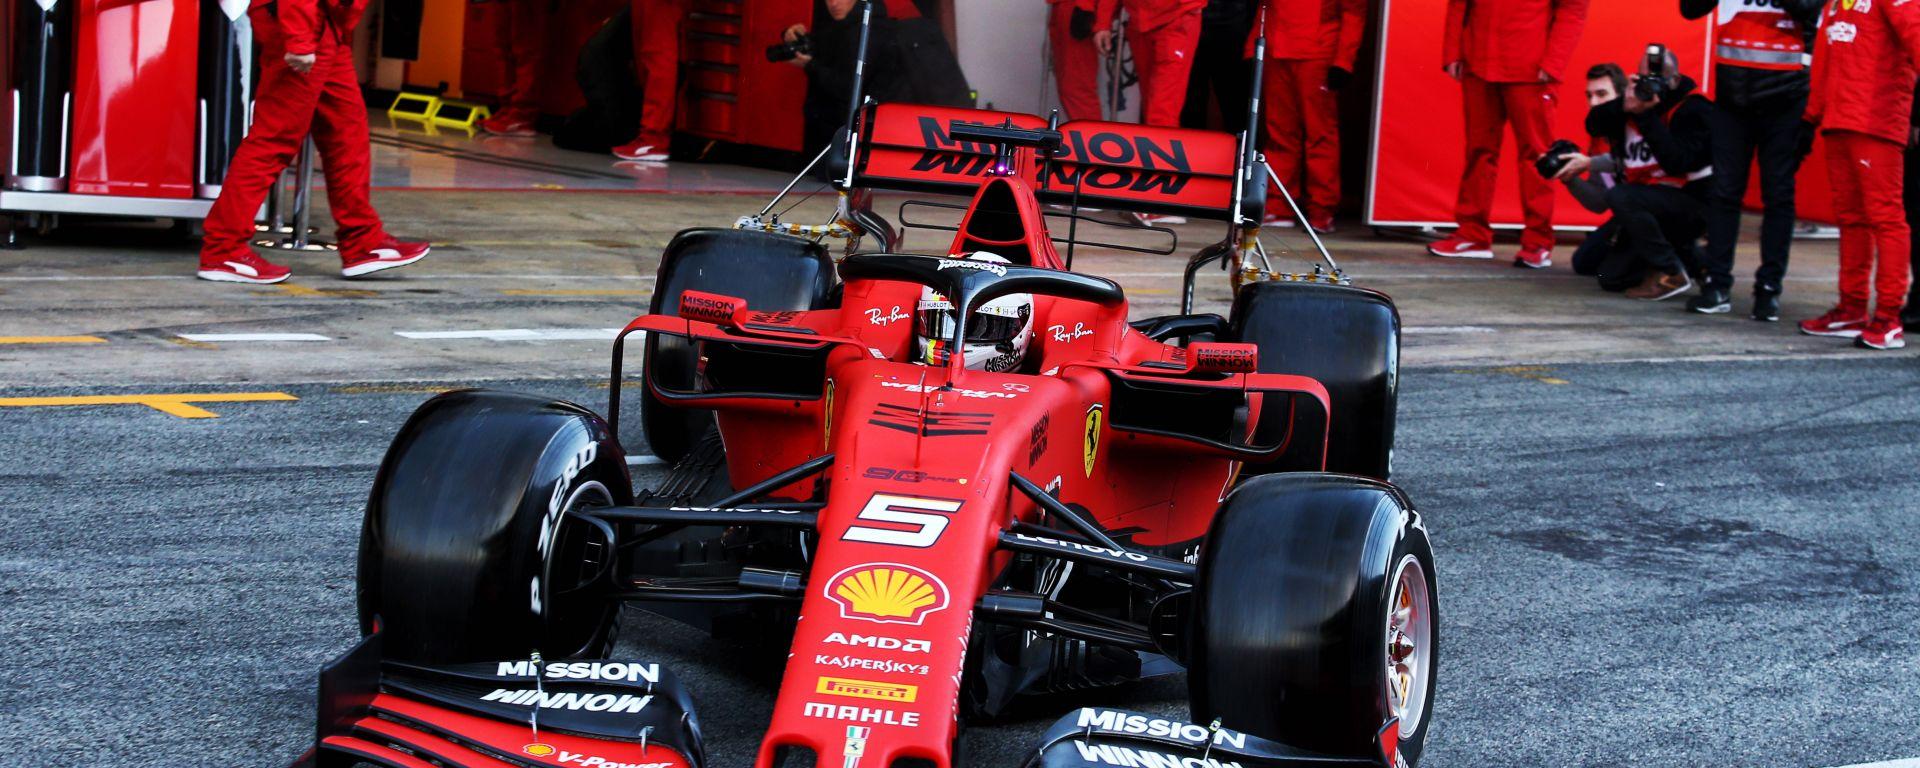 F1, test invernali 2019: Sebastian Vettel esce dal box Ferrari